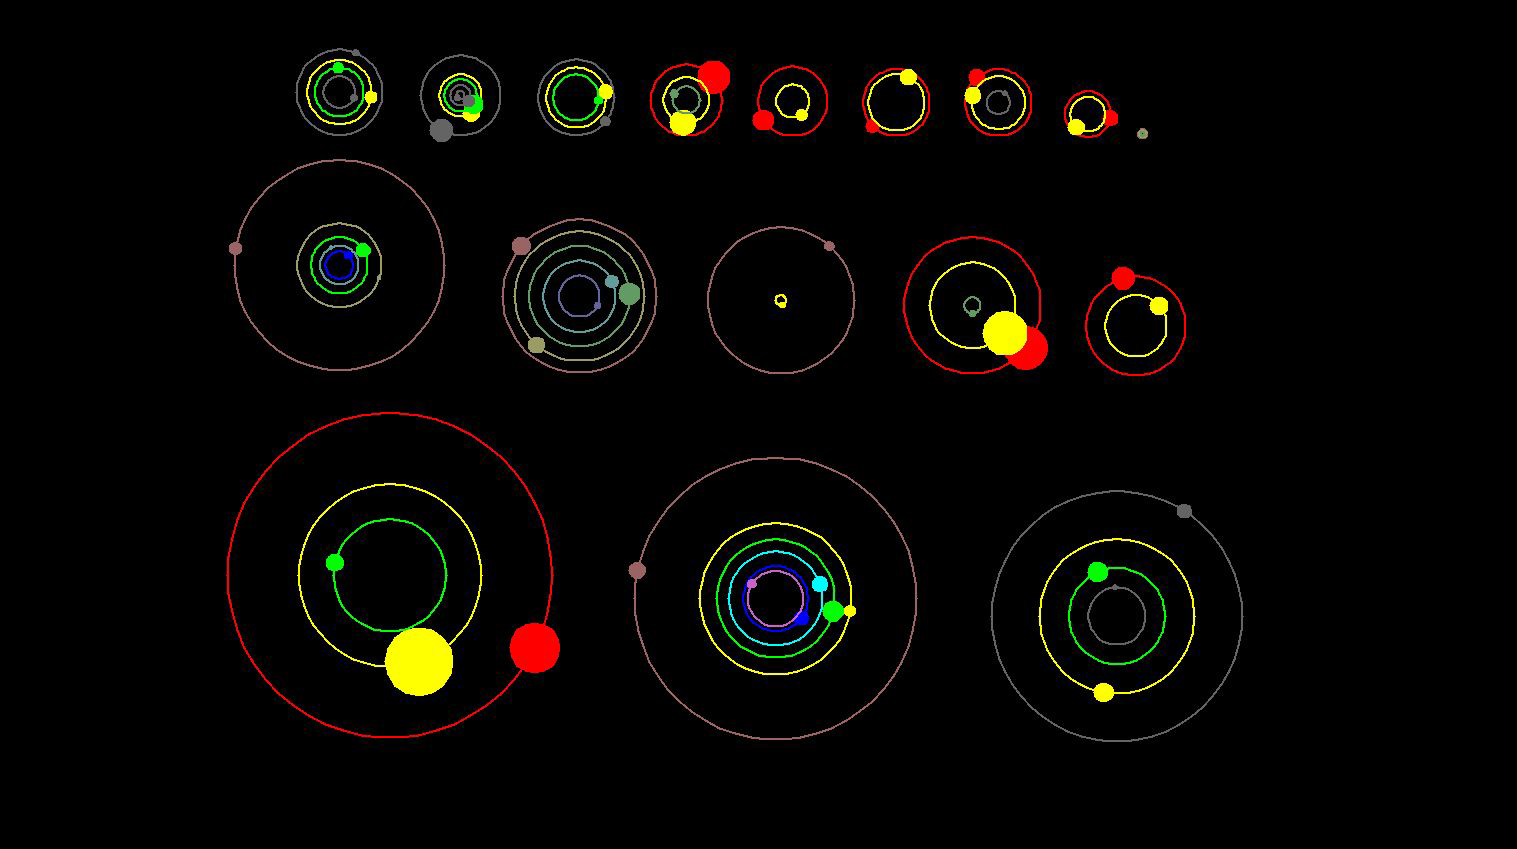 NASA Telescope Discovers 26 Alien Planets Around 11 Different Stars